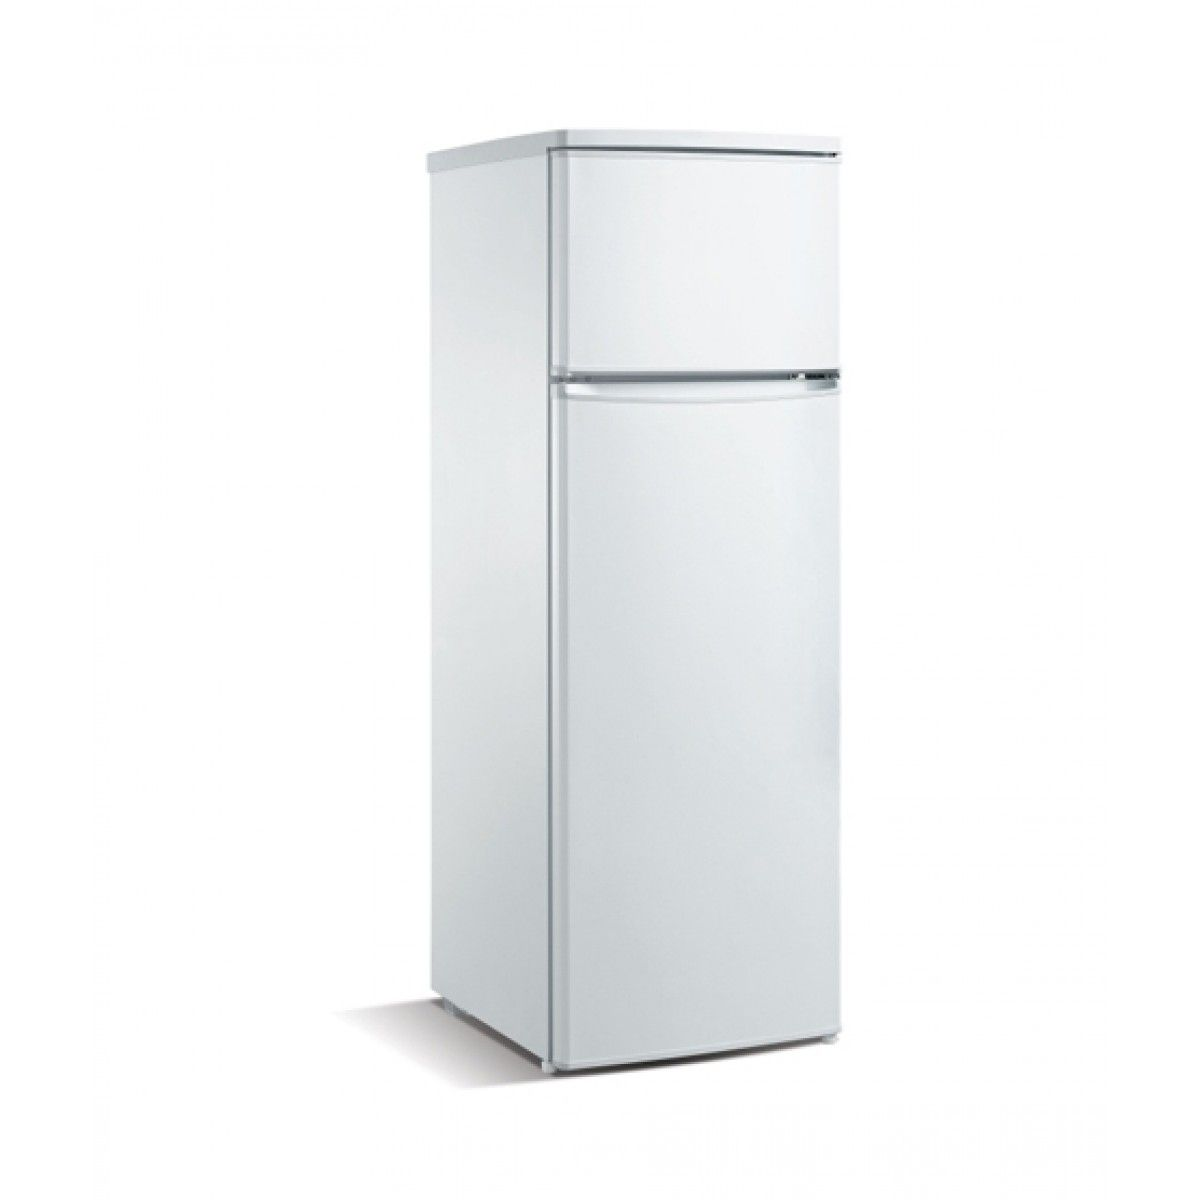 LG (GCS352SV) Freezer-on-Top 12 Cu Ft Refrigerator